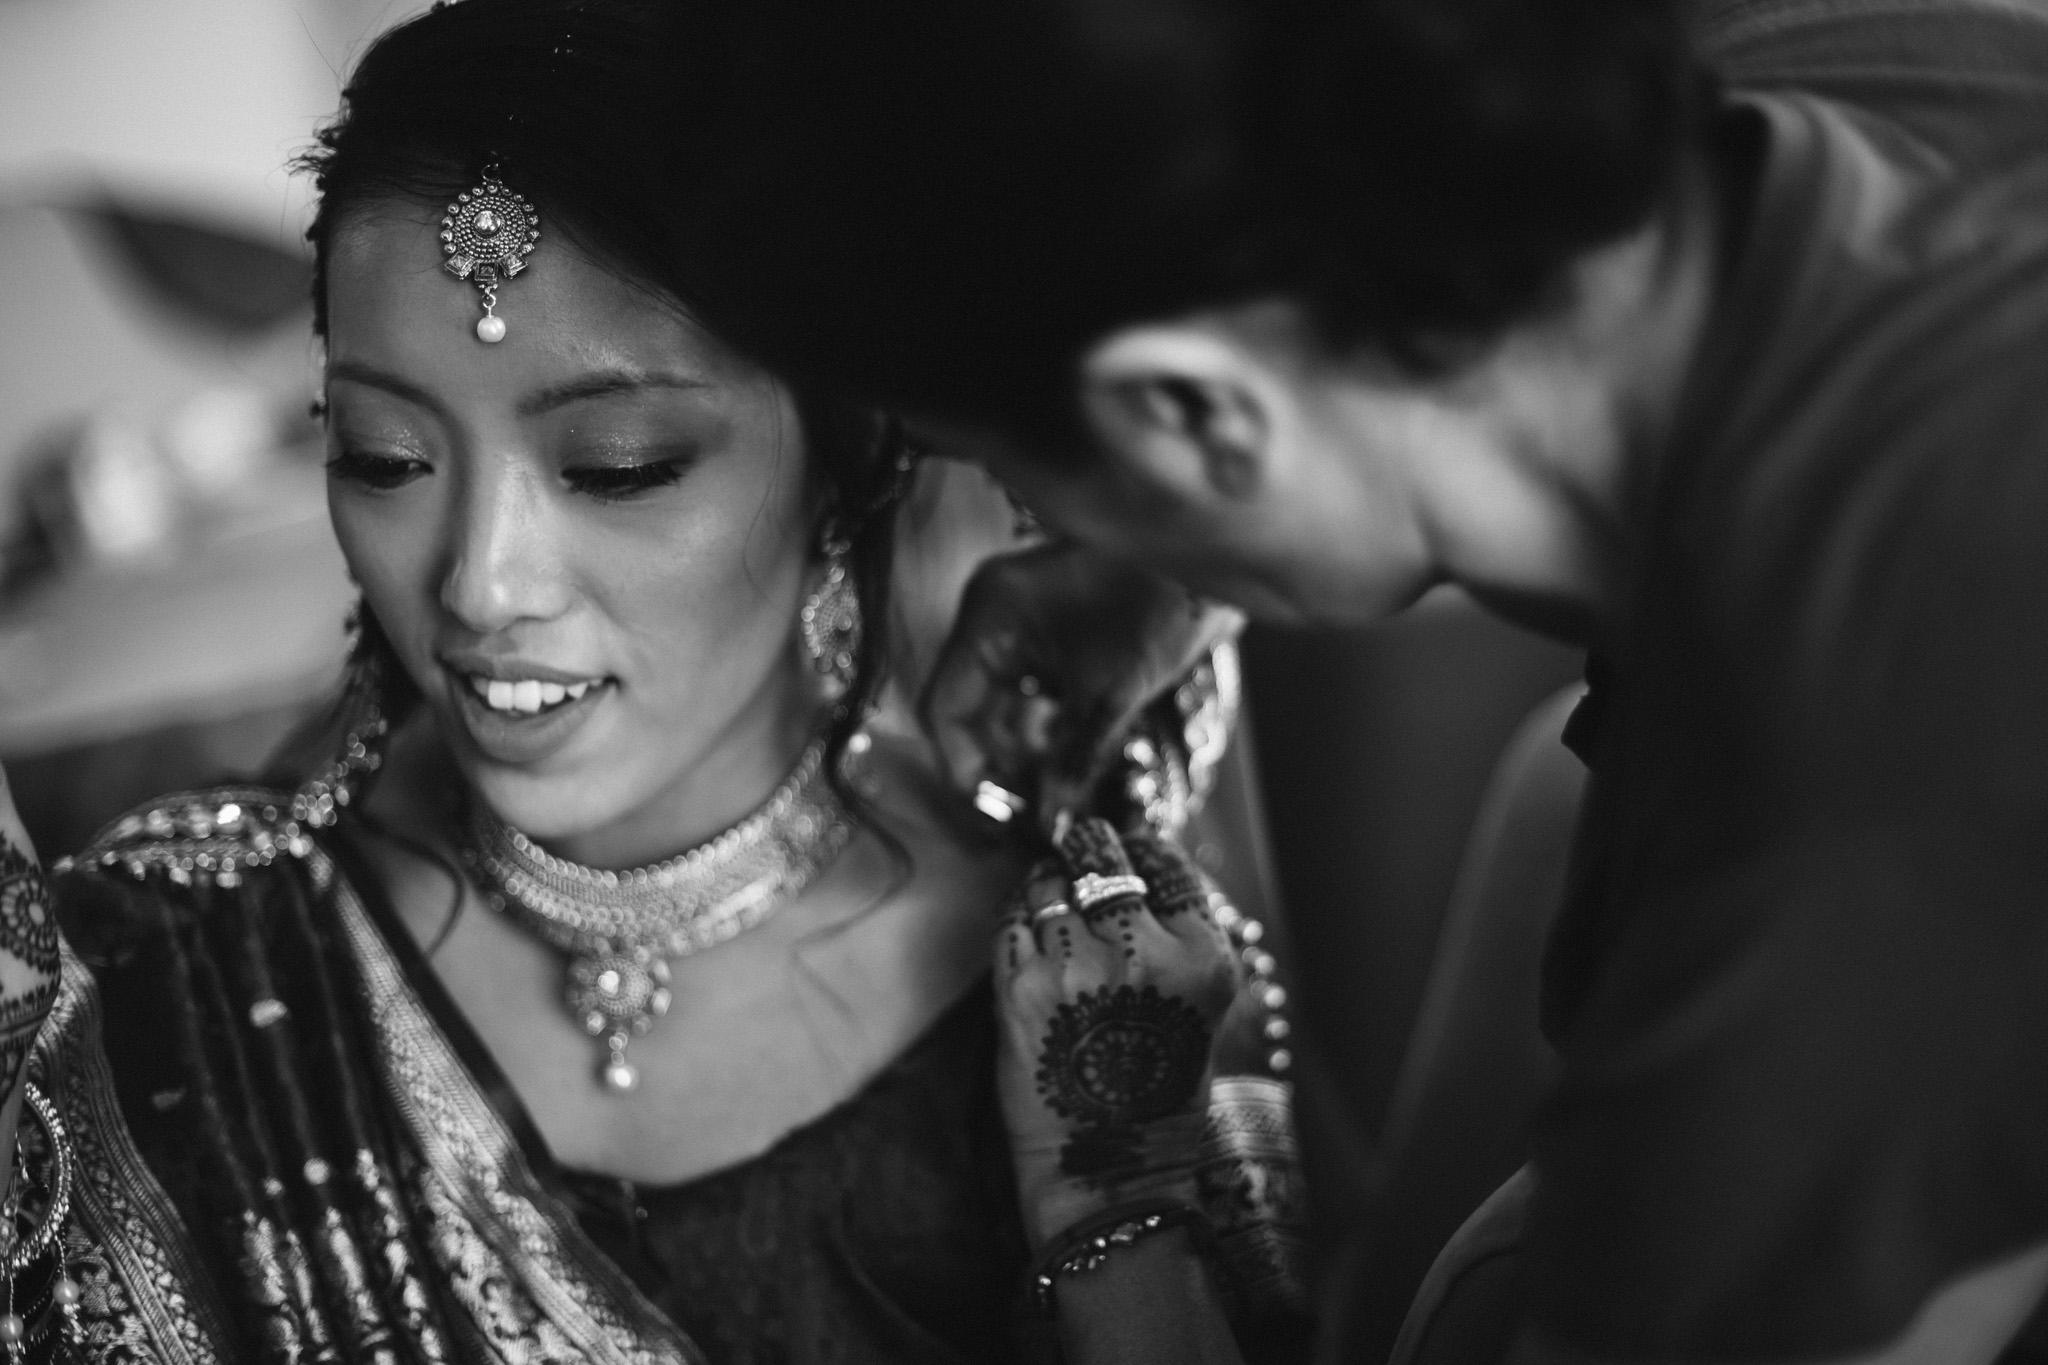 rebeccaburtphotography.hindiwedding.moraisvineyards.virginiawedding-37.JPG